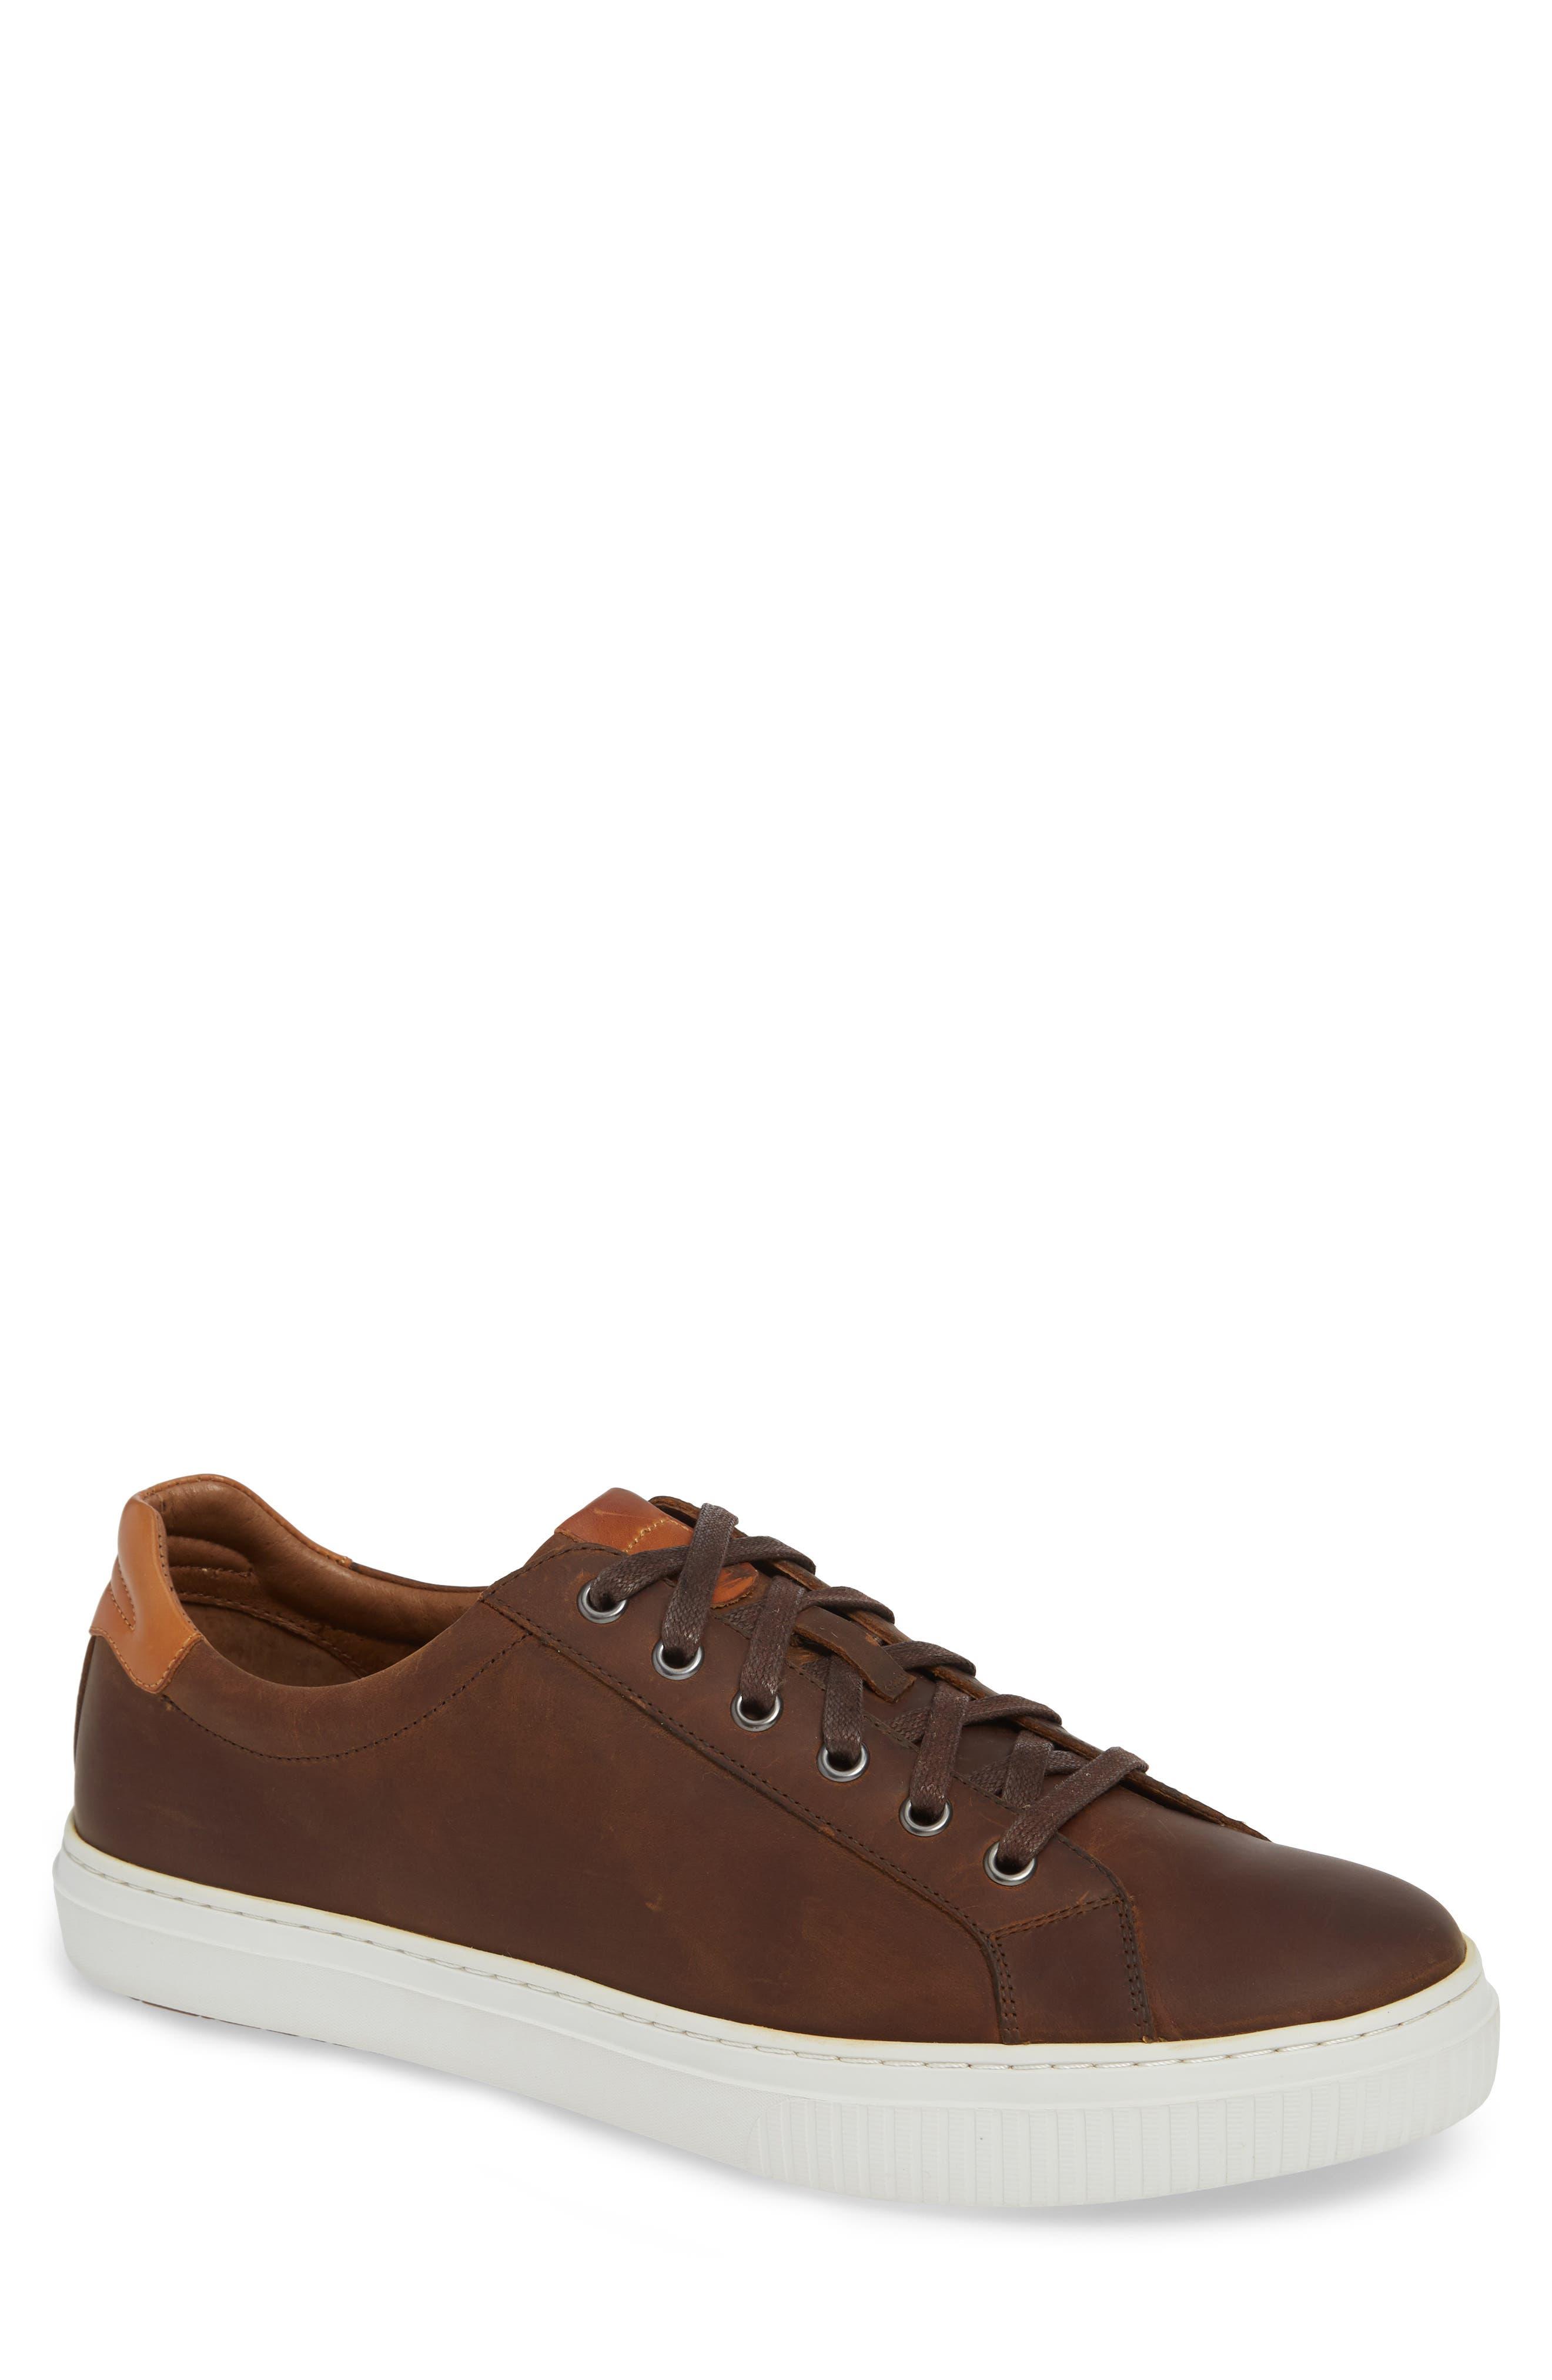 J & m 1850 Toliver Low Top Sneaker- Brown